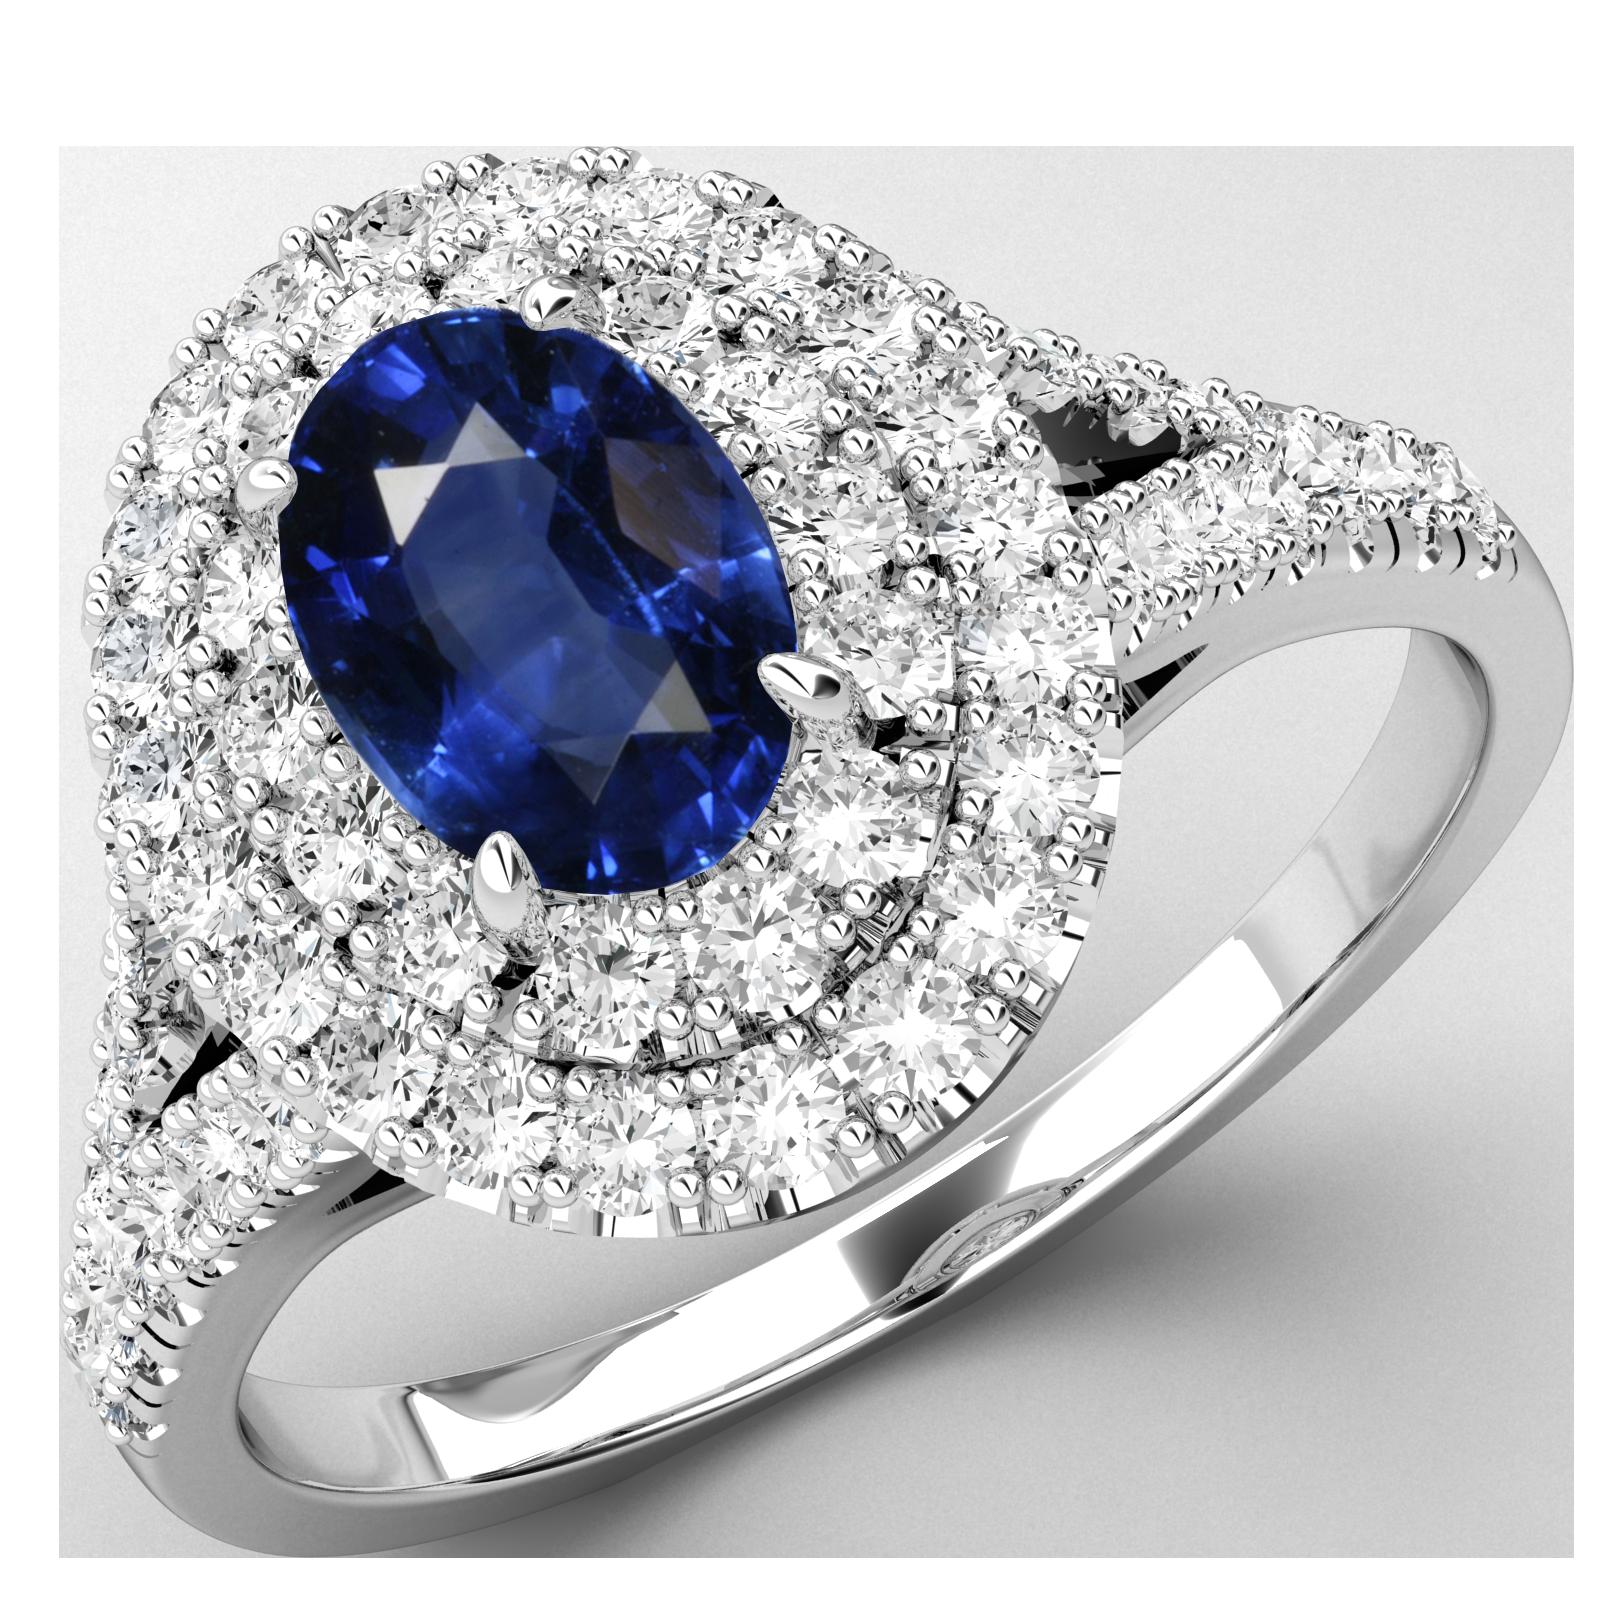 RDS762W-Inel Cocktail/Inel cu Safir si Diamante Dama Aur Alb 18kt cu un Safir Central Oval si Diamante Mici Rotund Briliant-img1